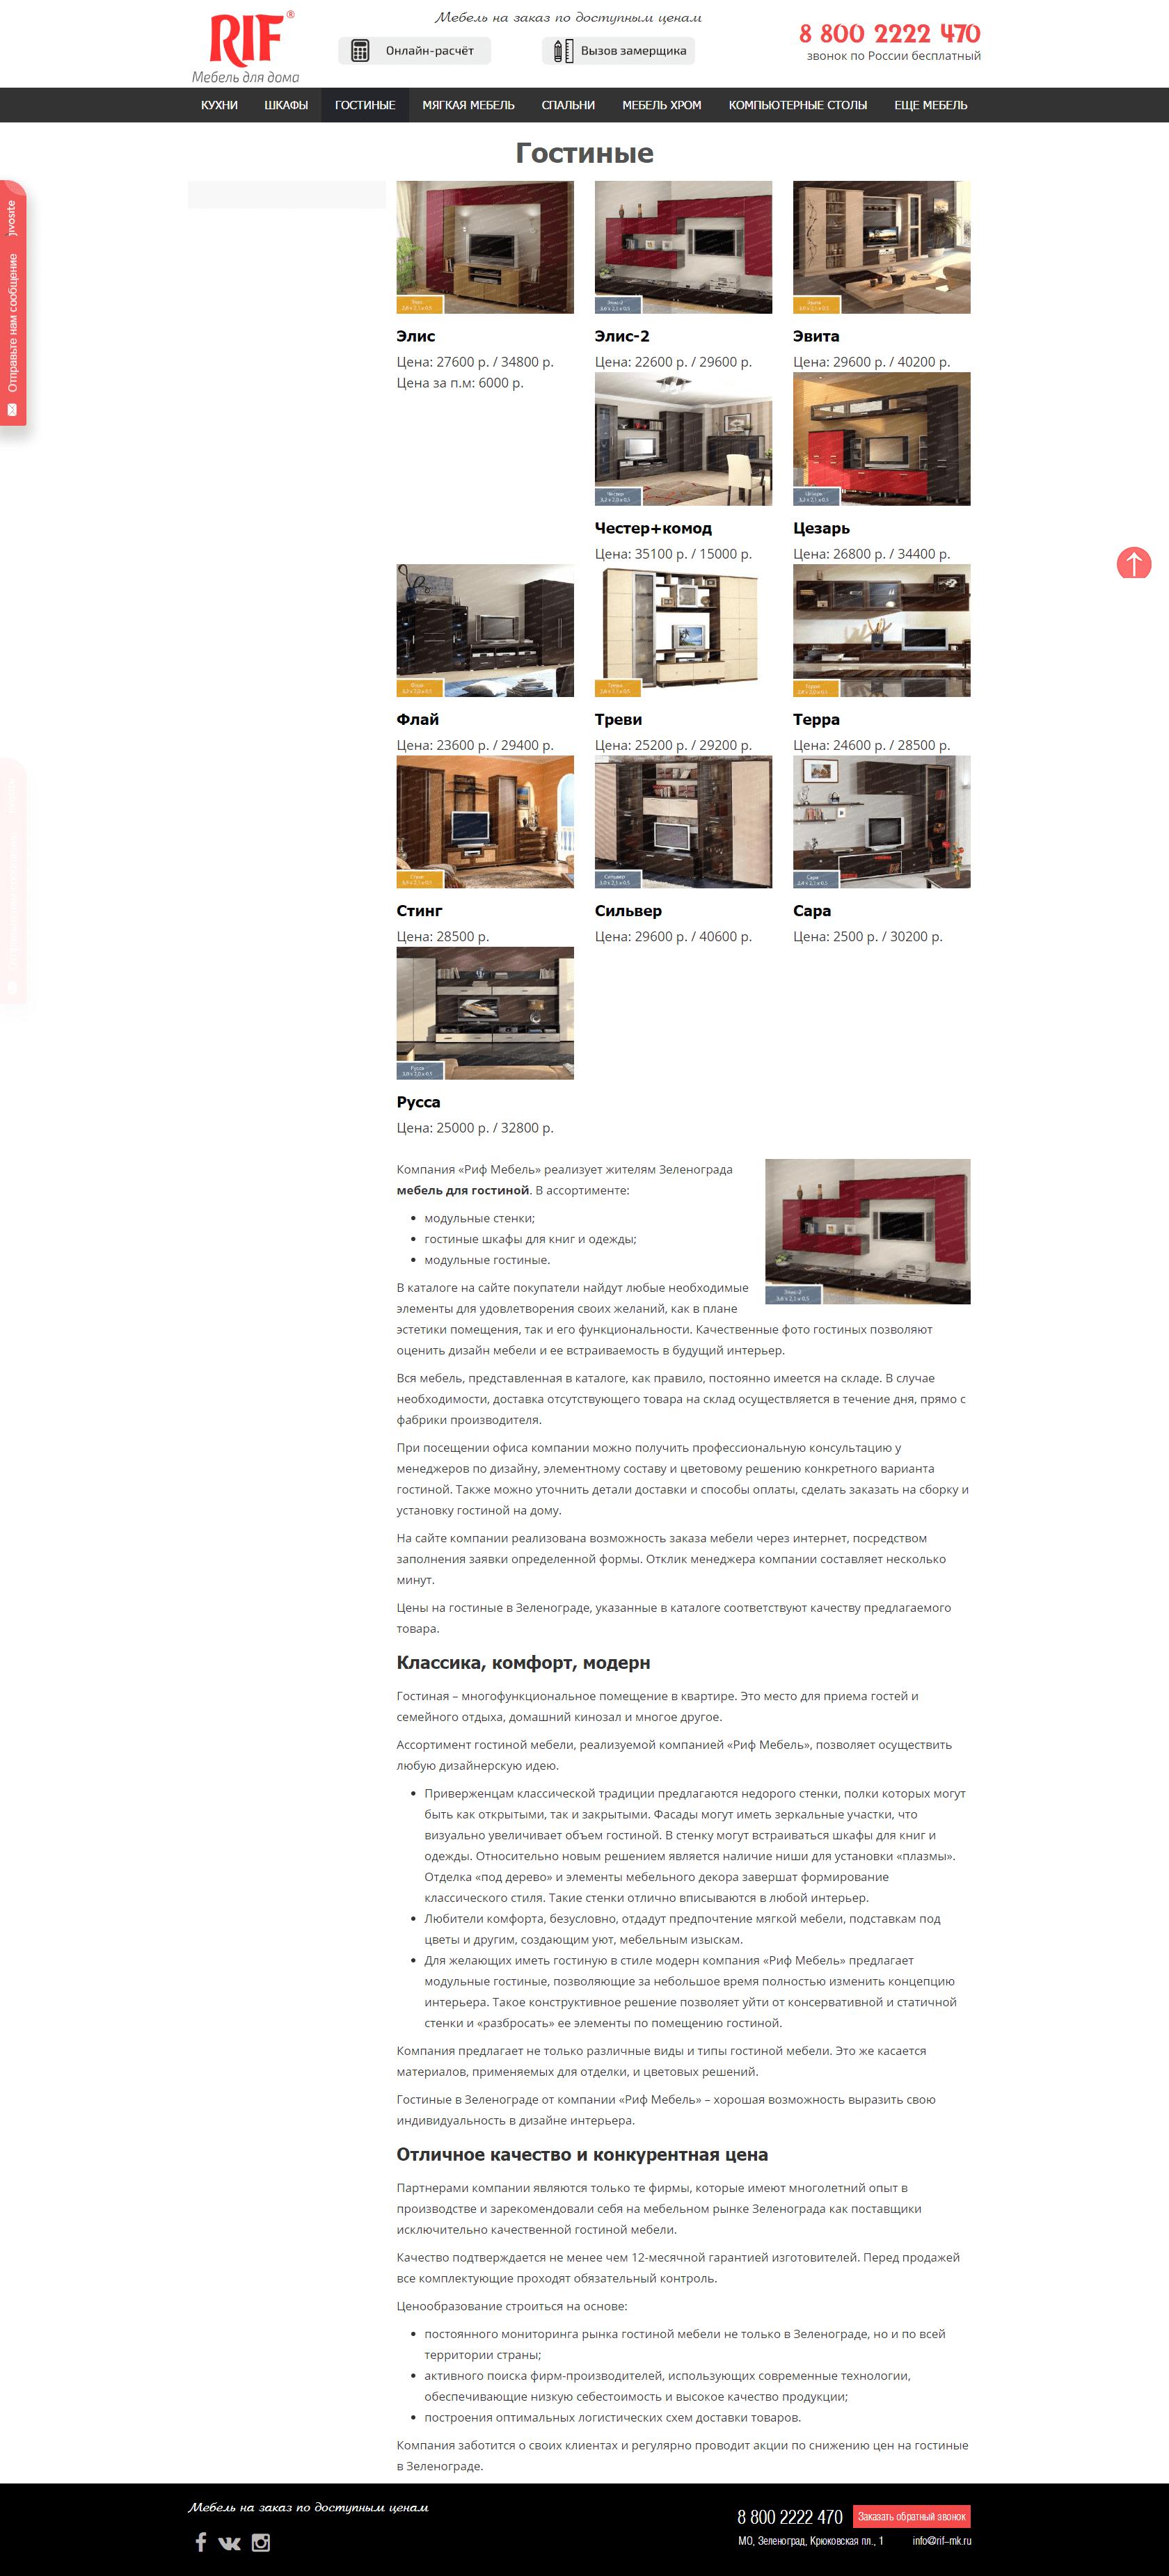 RIF-мебель для дома